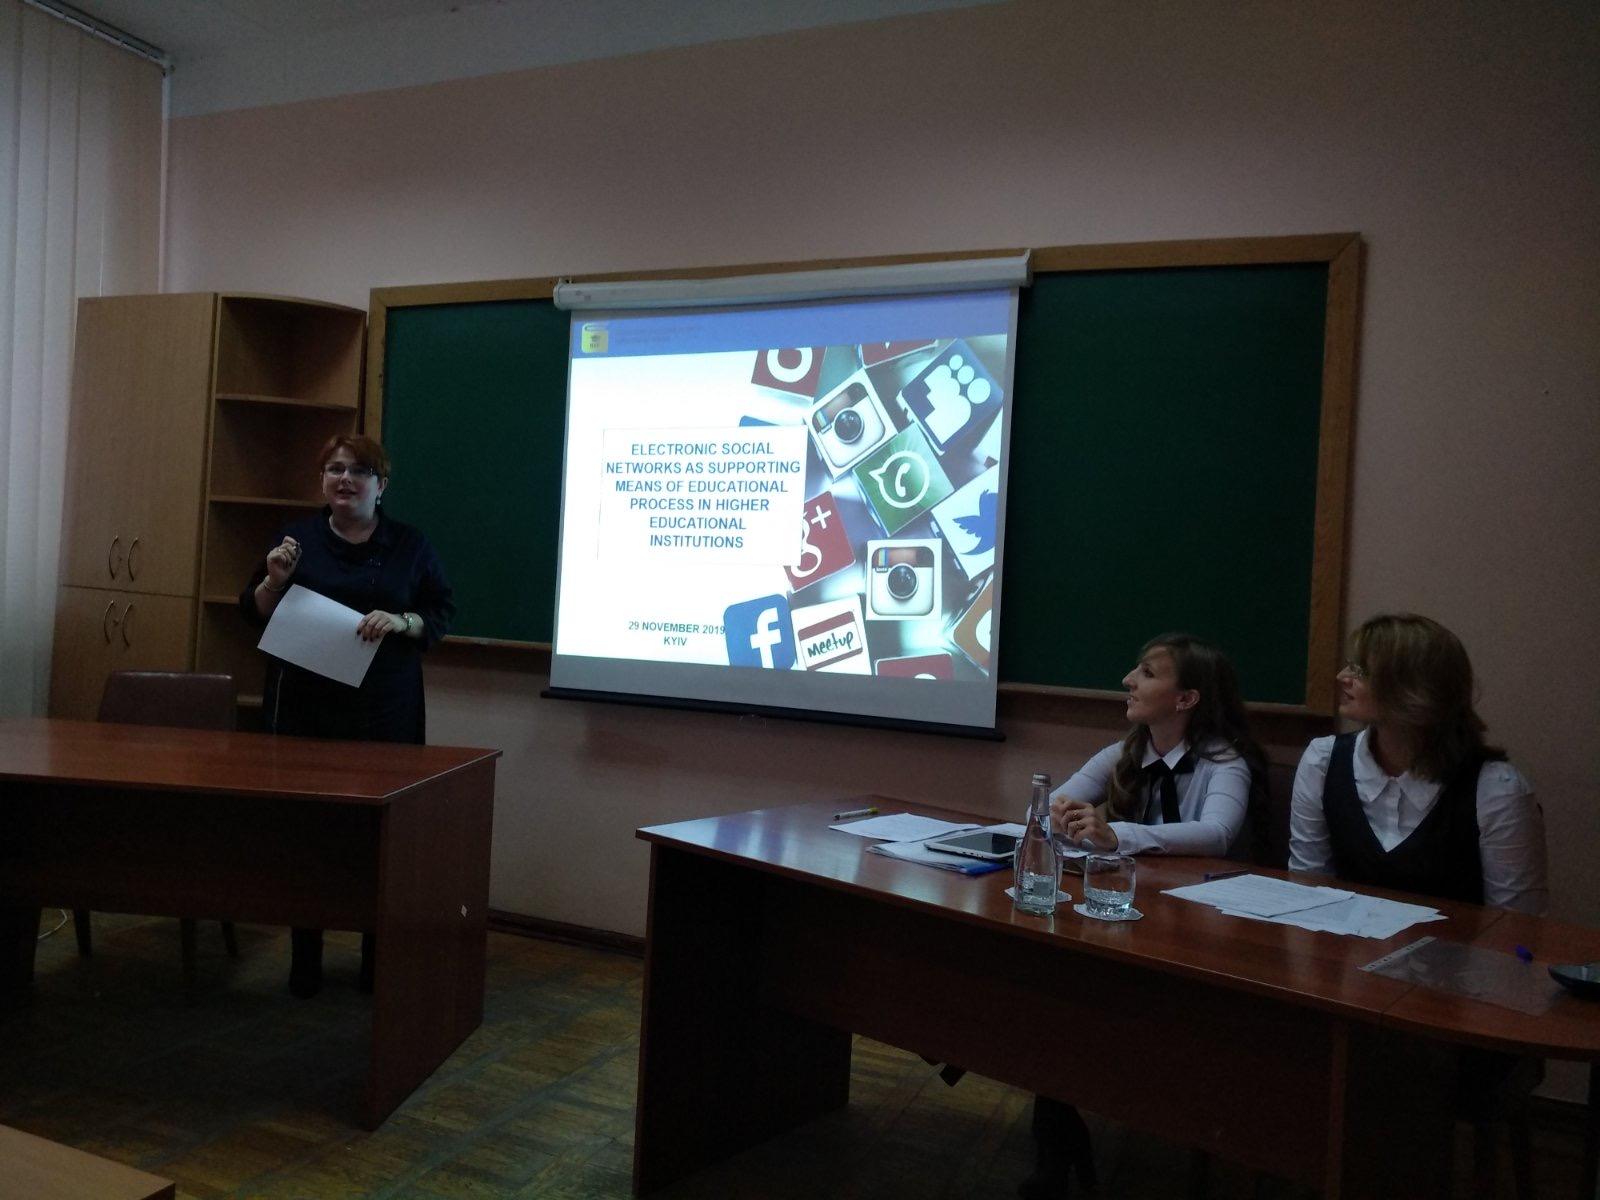 УЧАСТЬ ННІНО У 1st International Workshop on Cyber Hygiene & Conflict Management in Global Information Networks.